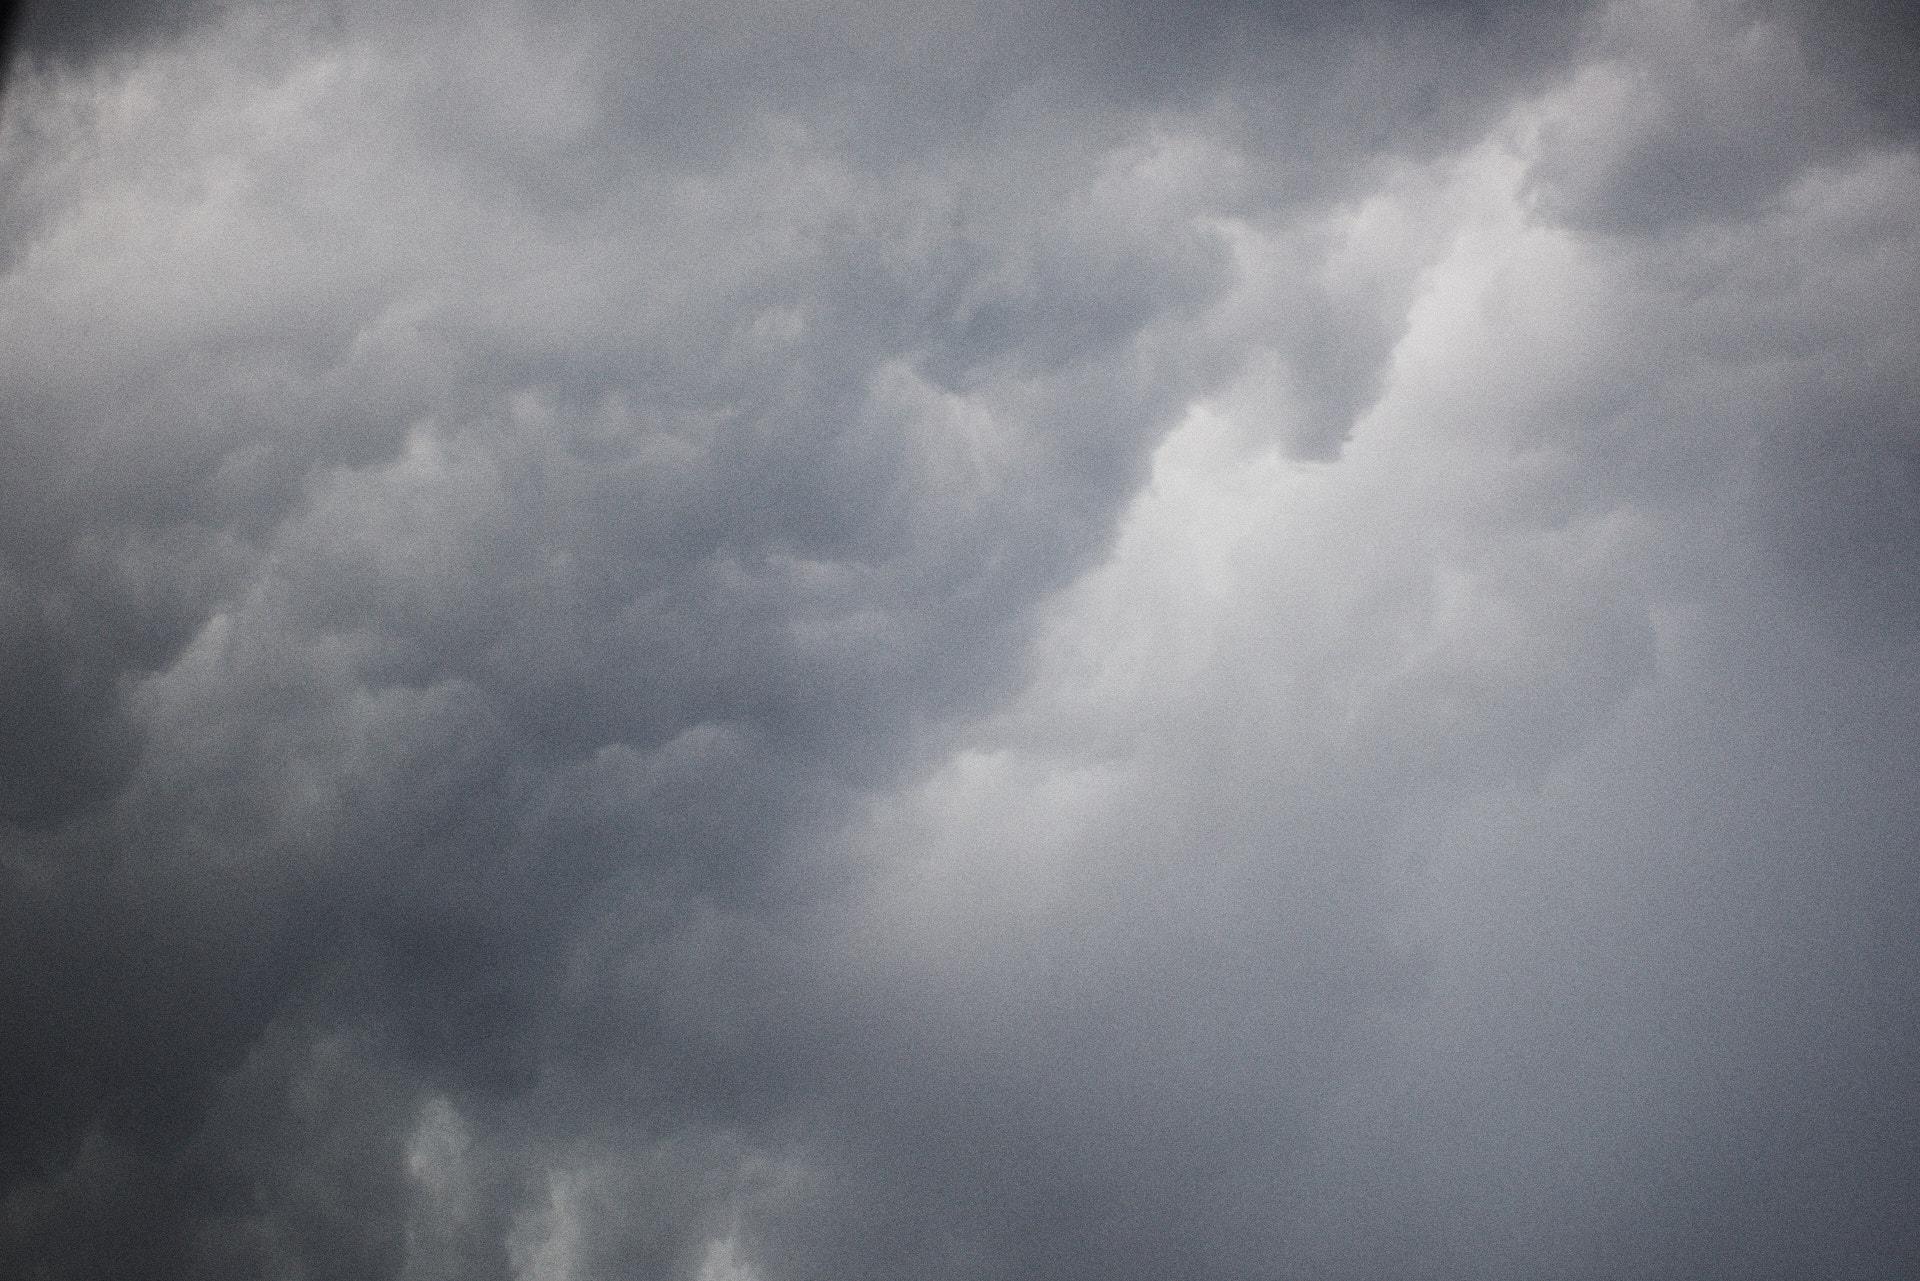 June 26th – Heavy rain